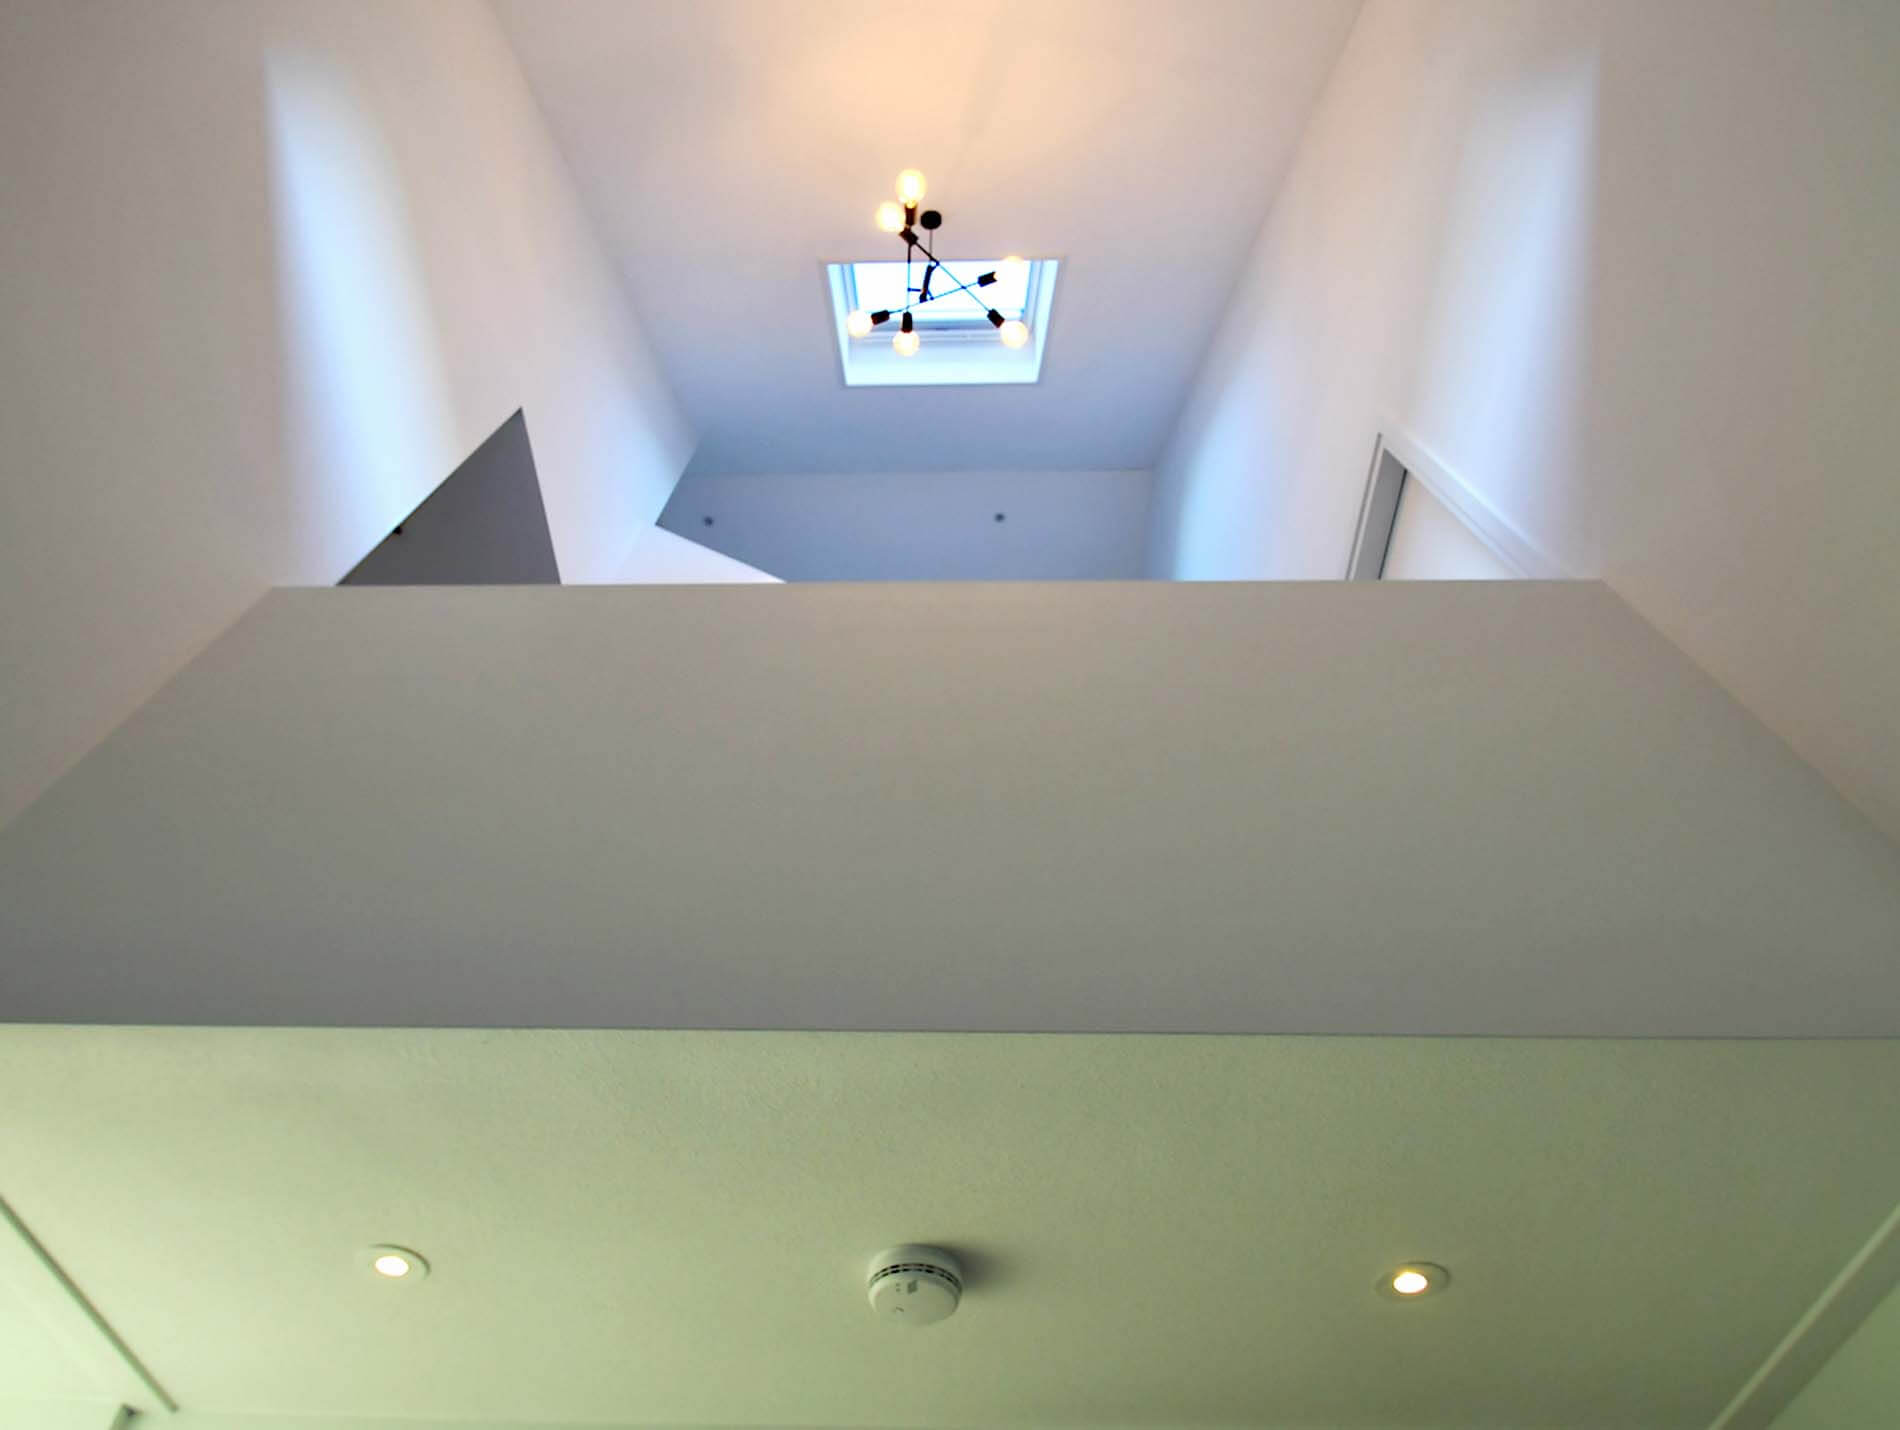 4. Drachten-nieuwbouw-woning-1900x1430p.jpg